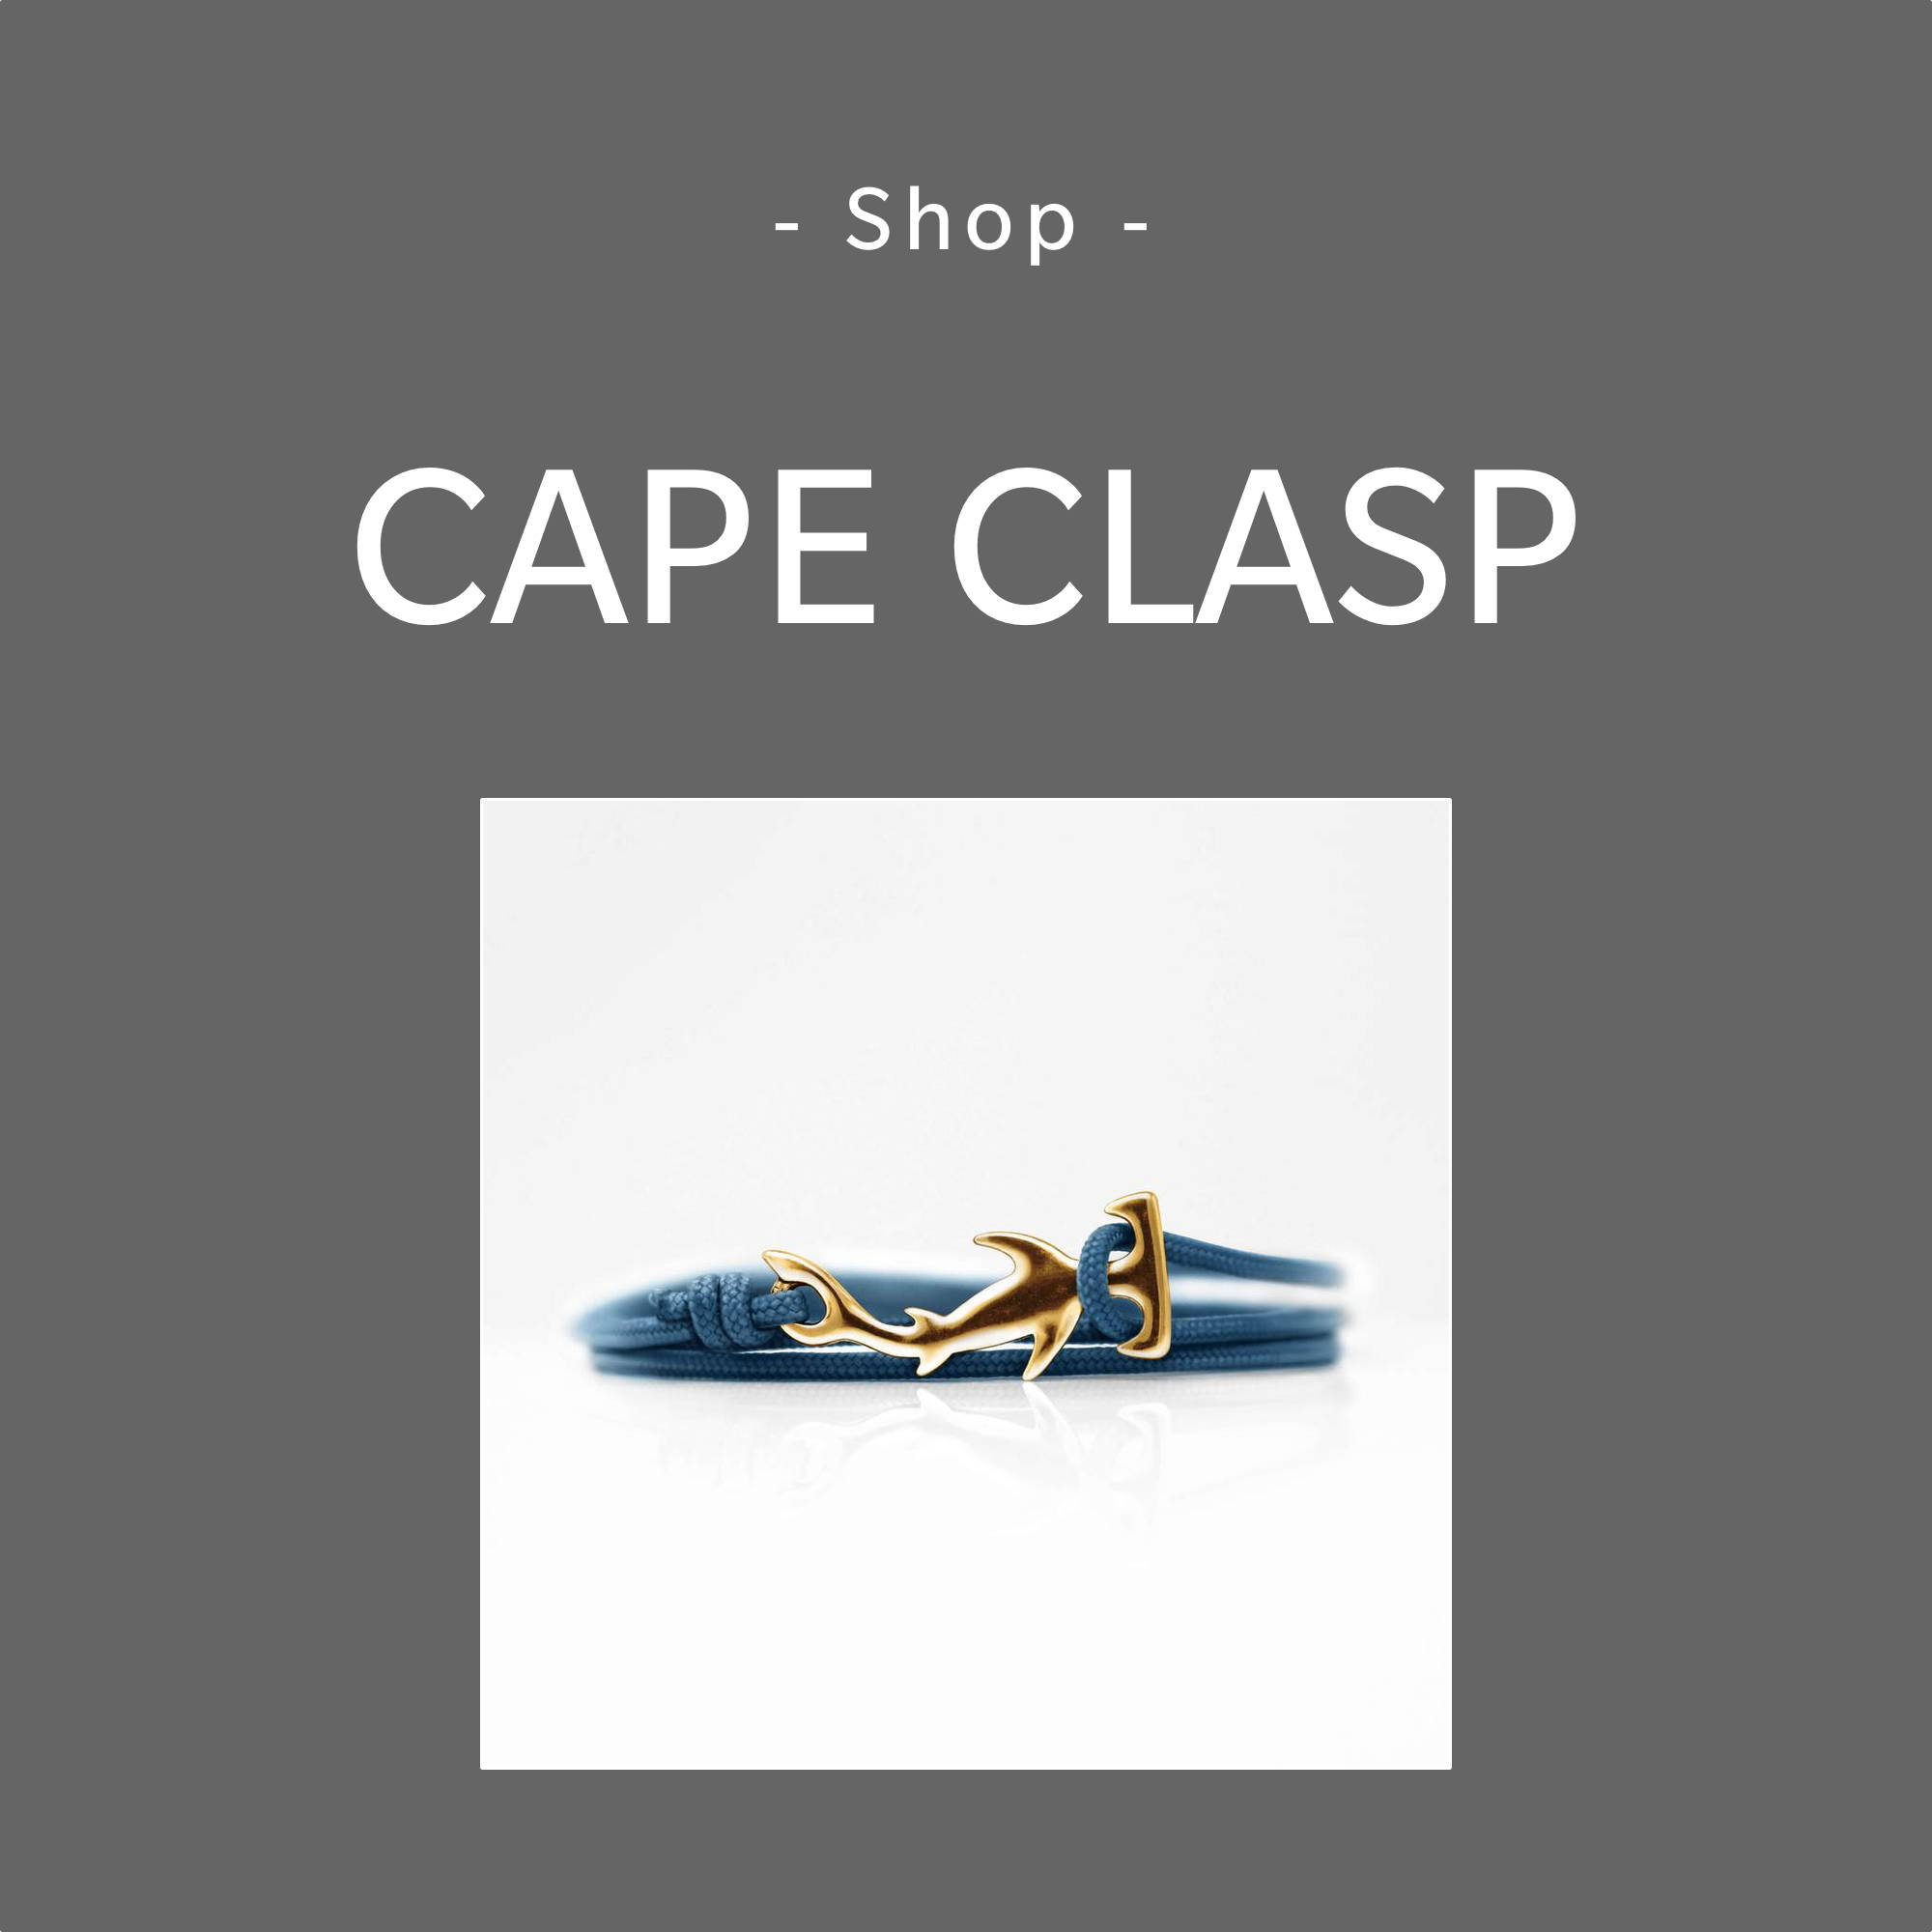 Cape Clasp Brand Page